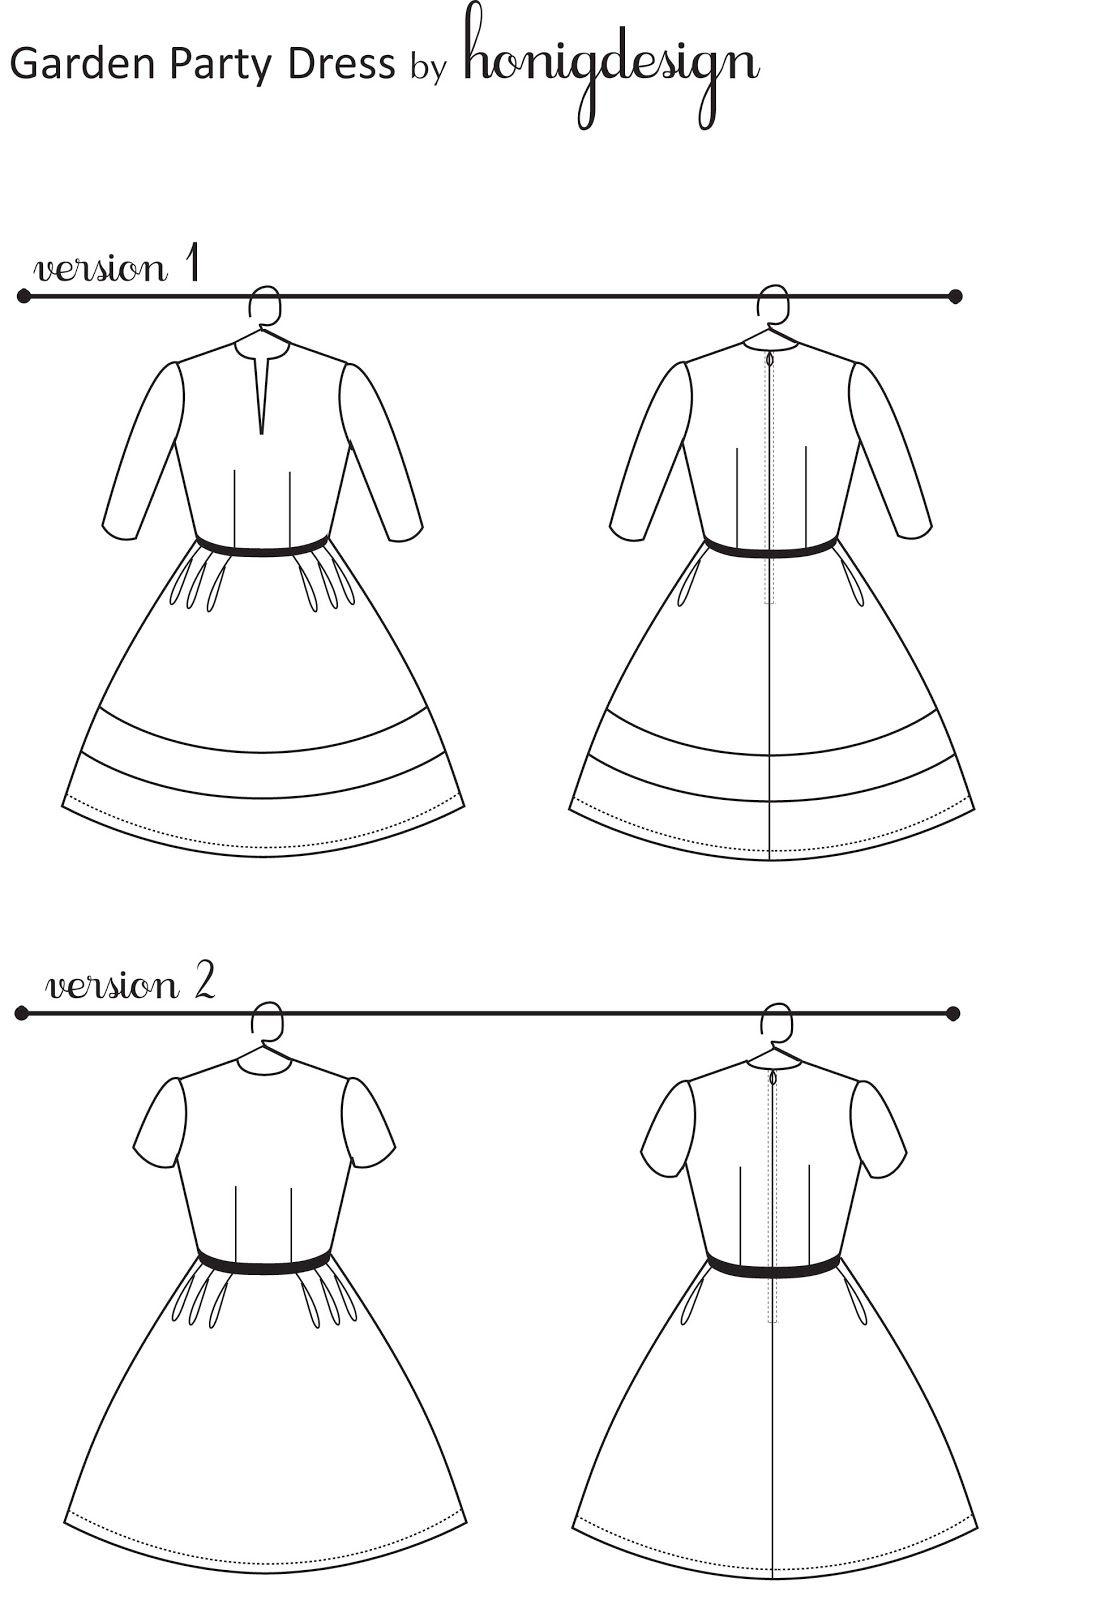 Honigdesign Garden Party Dress Pattern Free Party Dress Patterns Dress Patterns Free Garden Party Dress